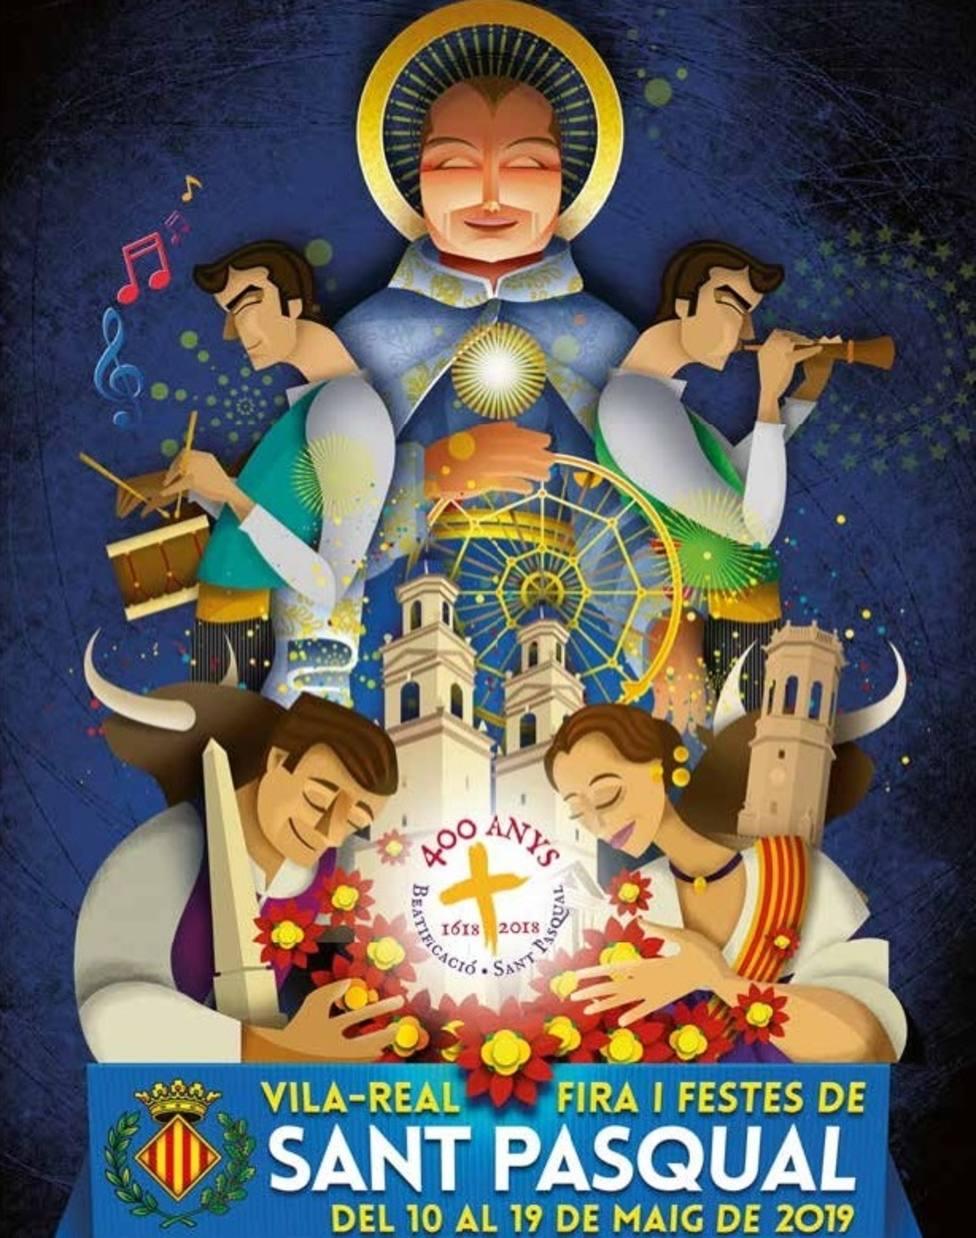 Fiestas de San Pascual en Vila-real